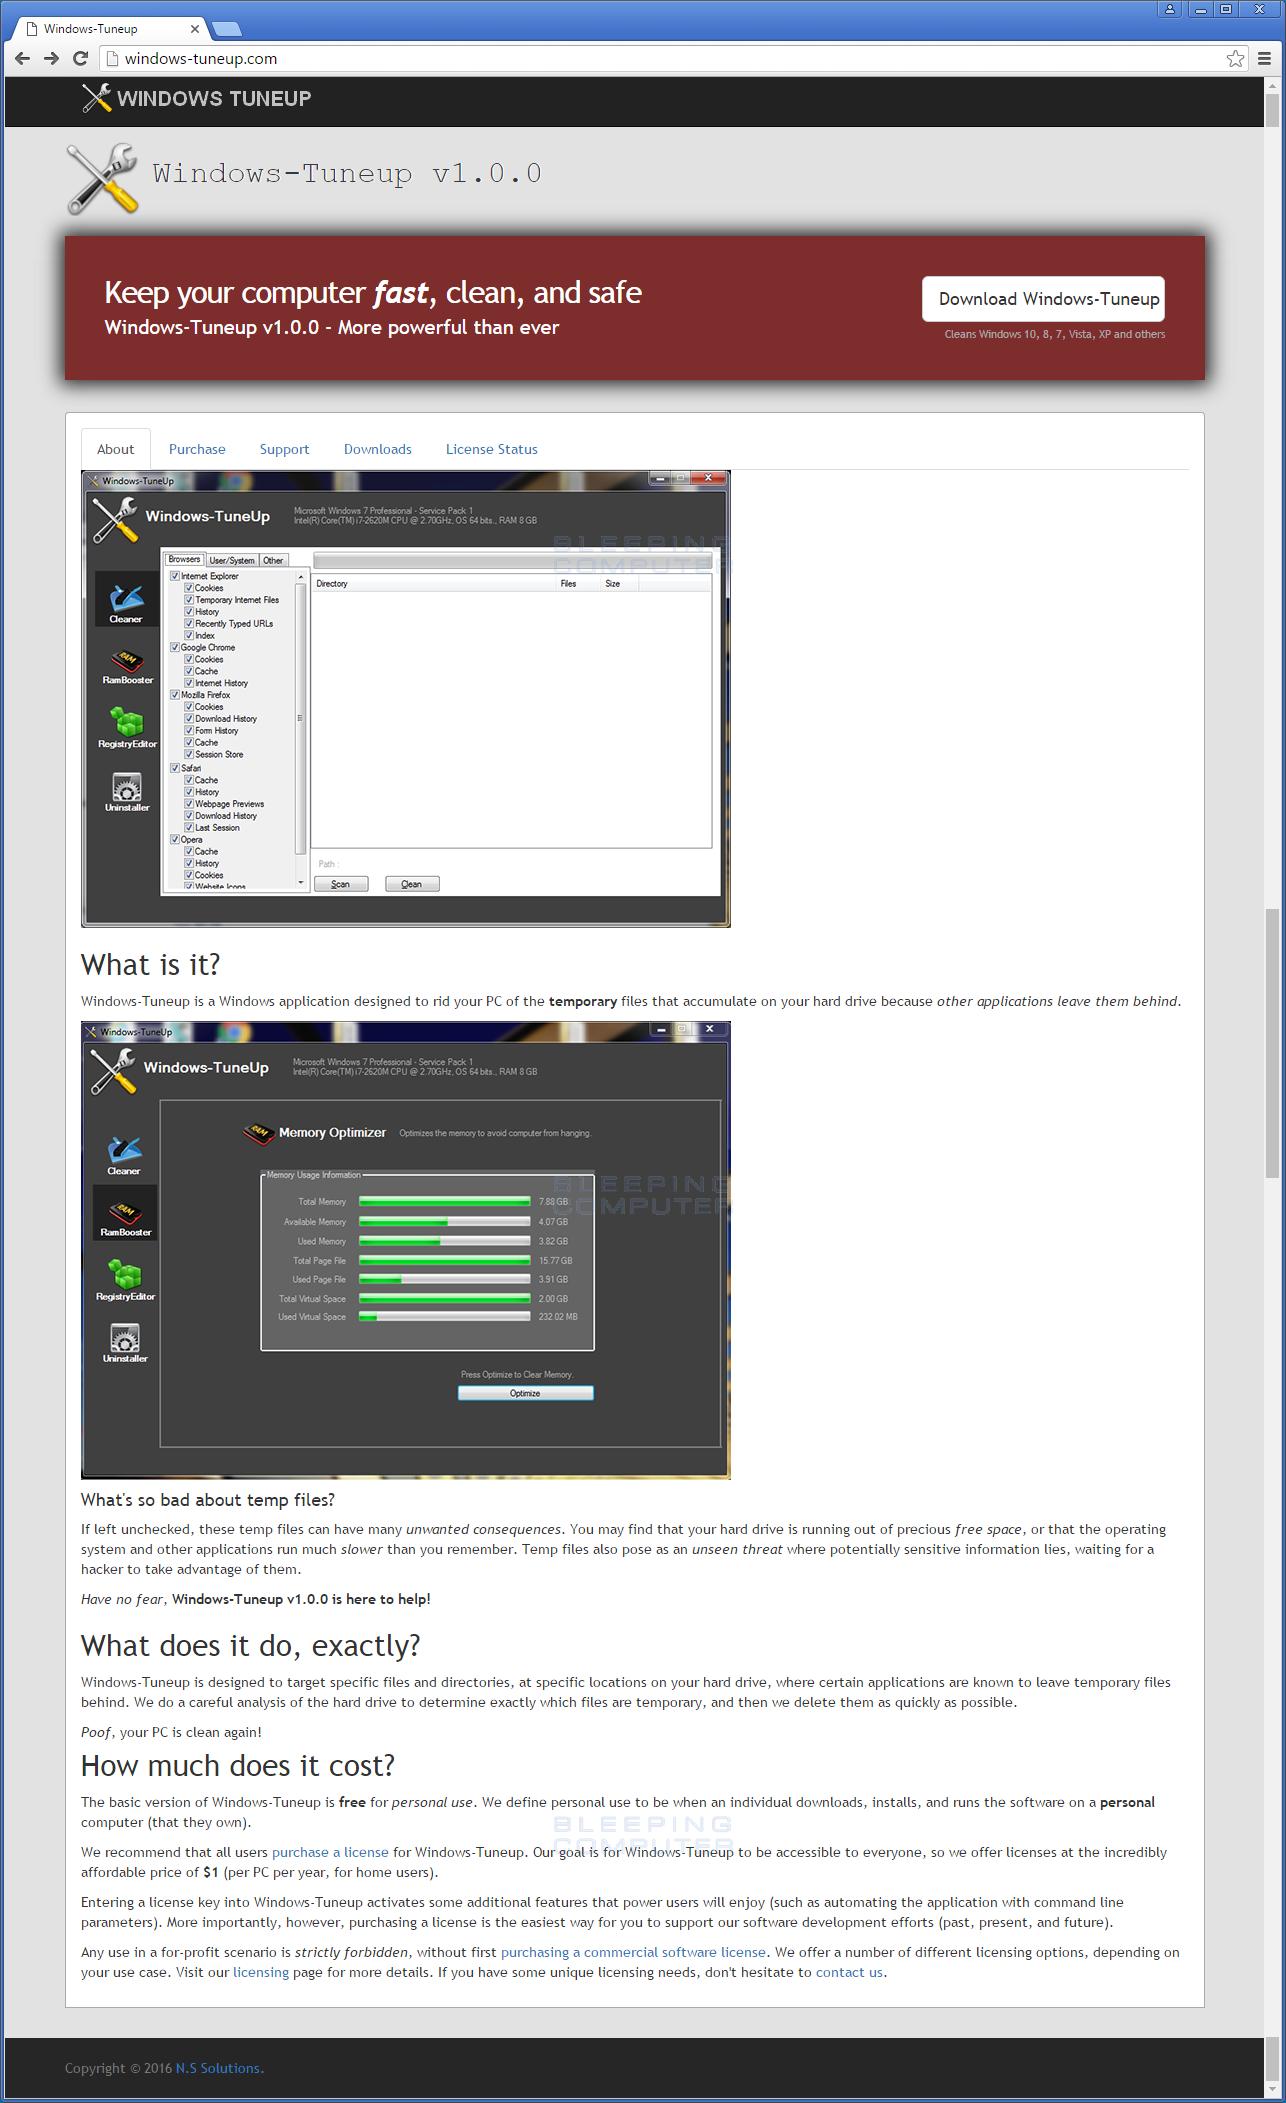 Windows-TuneUp Web Site